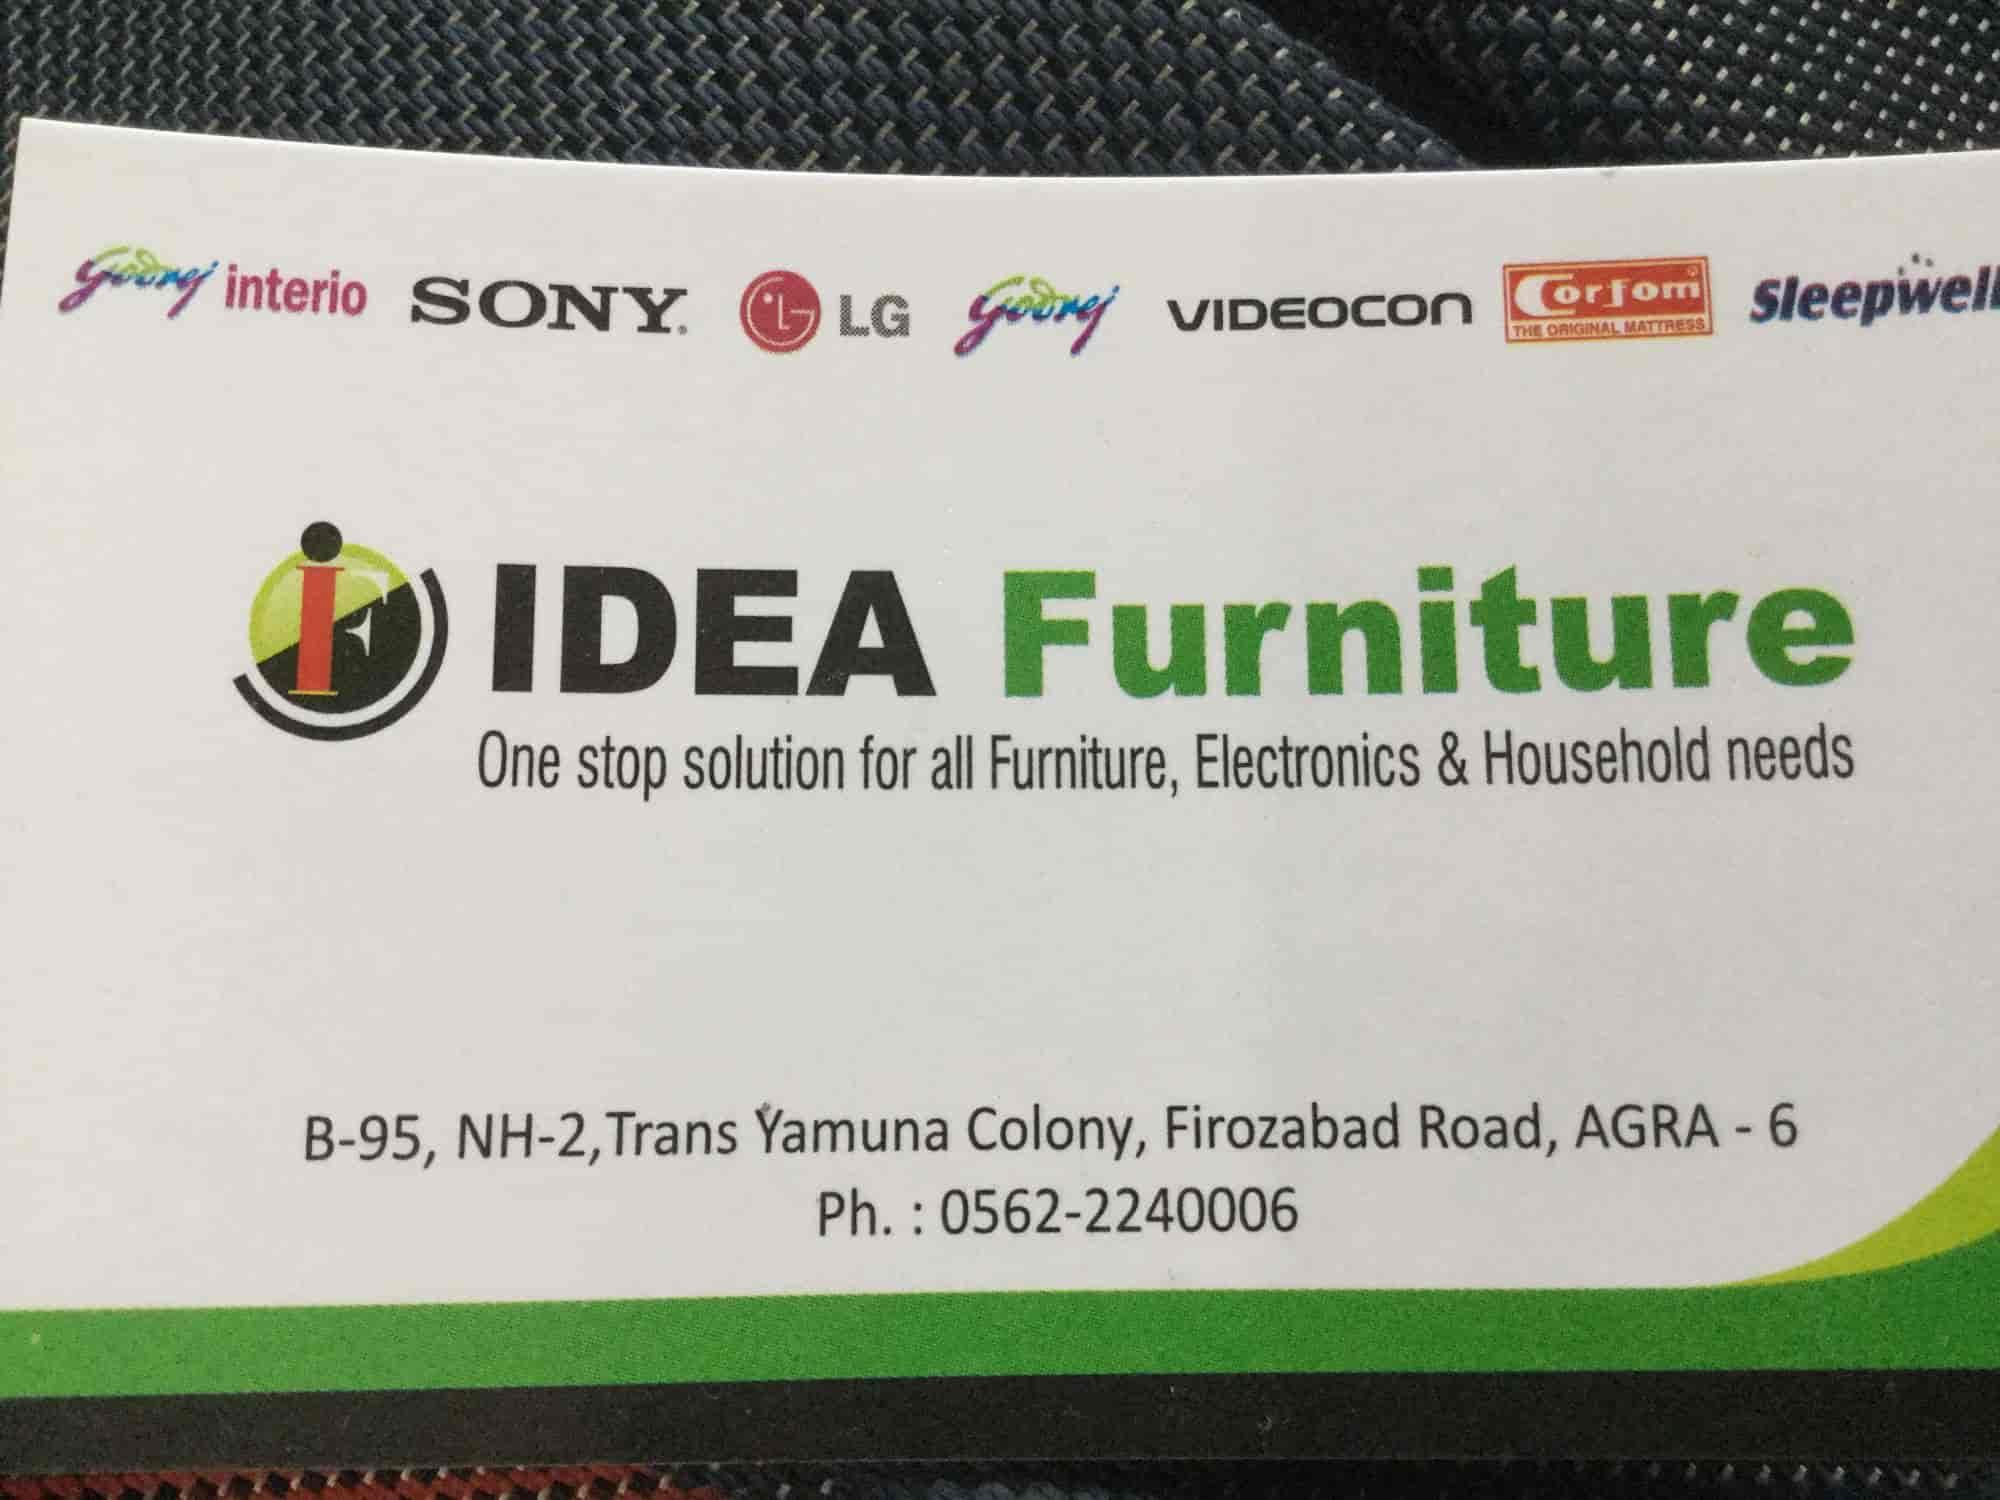 Idea Furniture